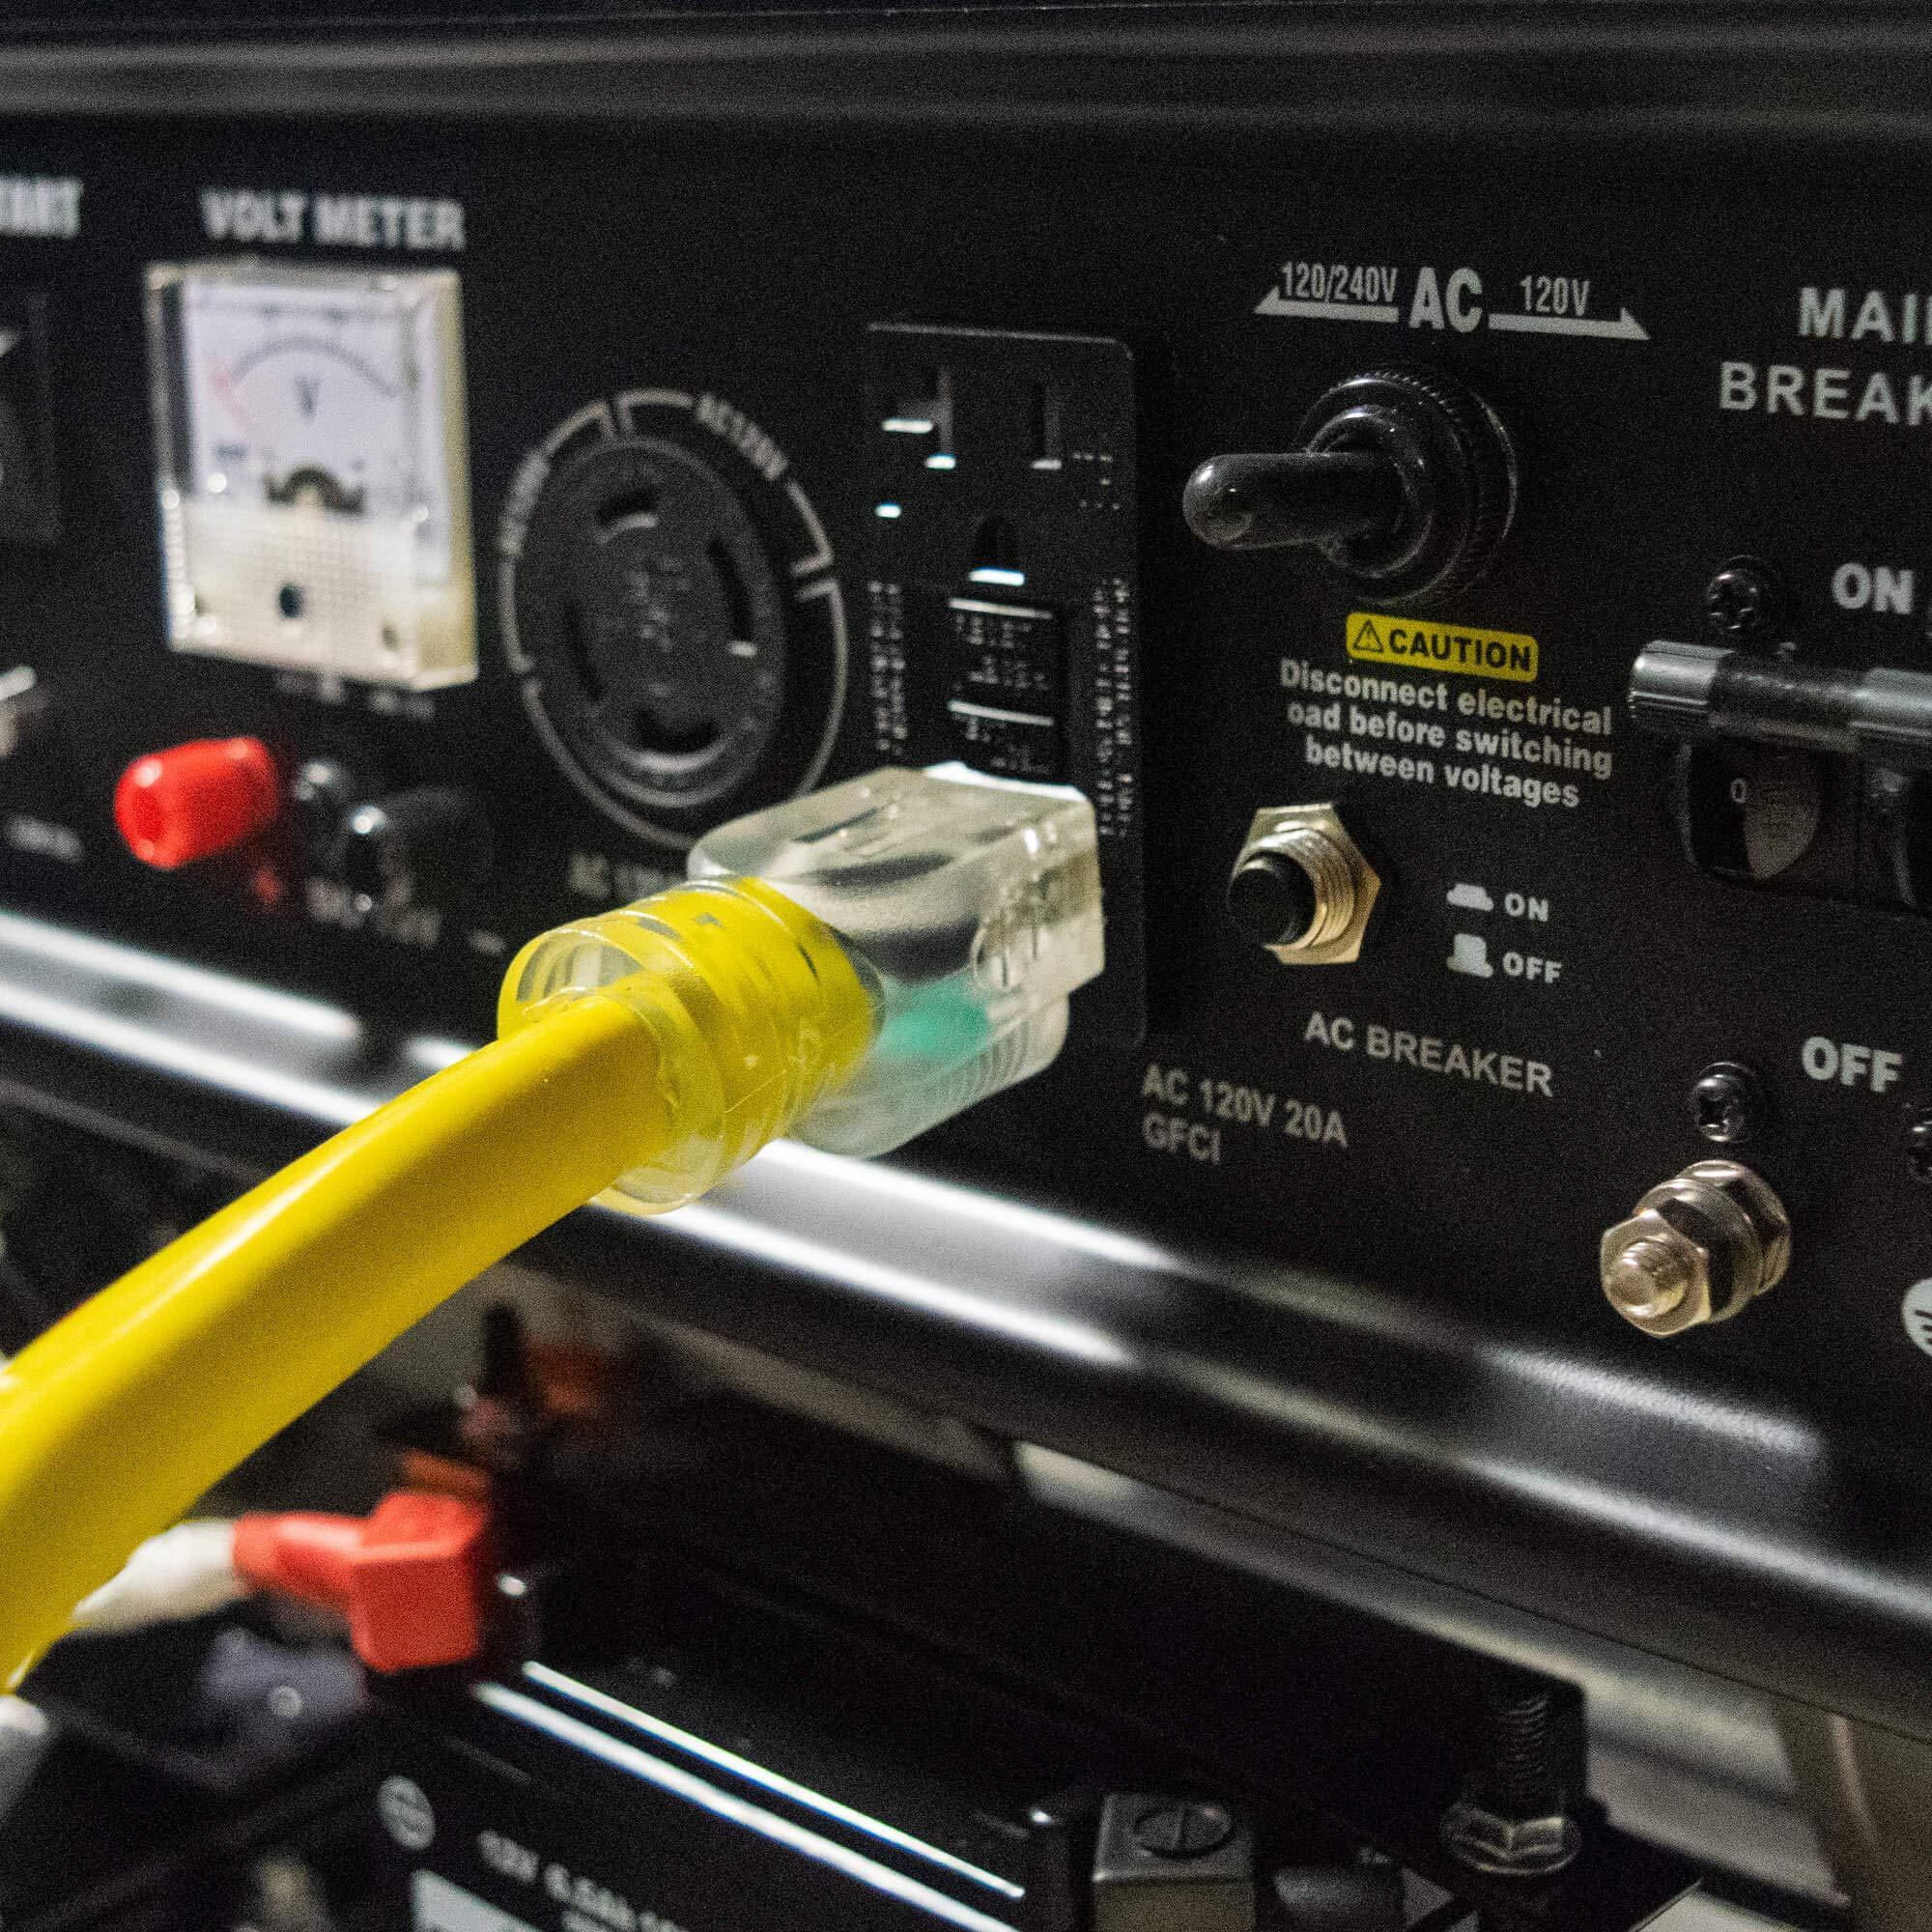 DuroMax Hybrid Dual Fuel XP4400EH 4,400-Watt Portable Generator by DuroMax (Image #14)